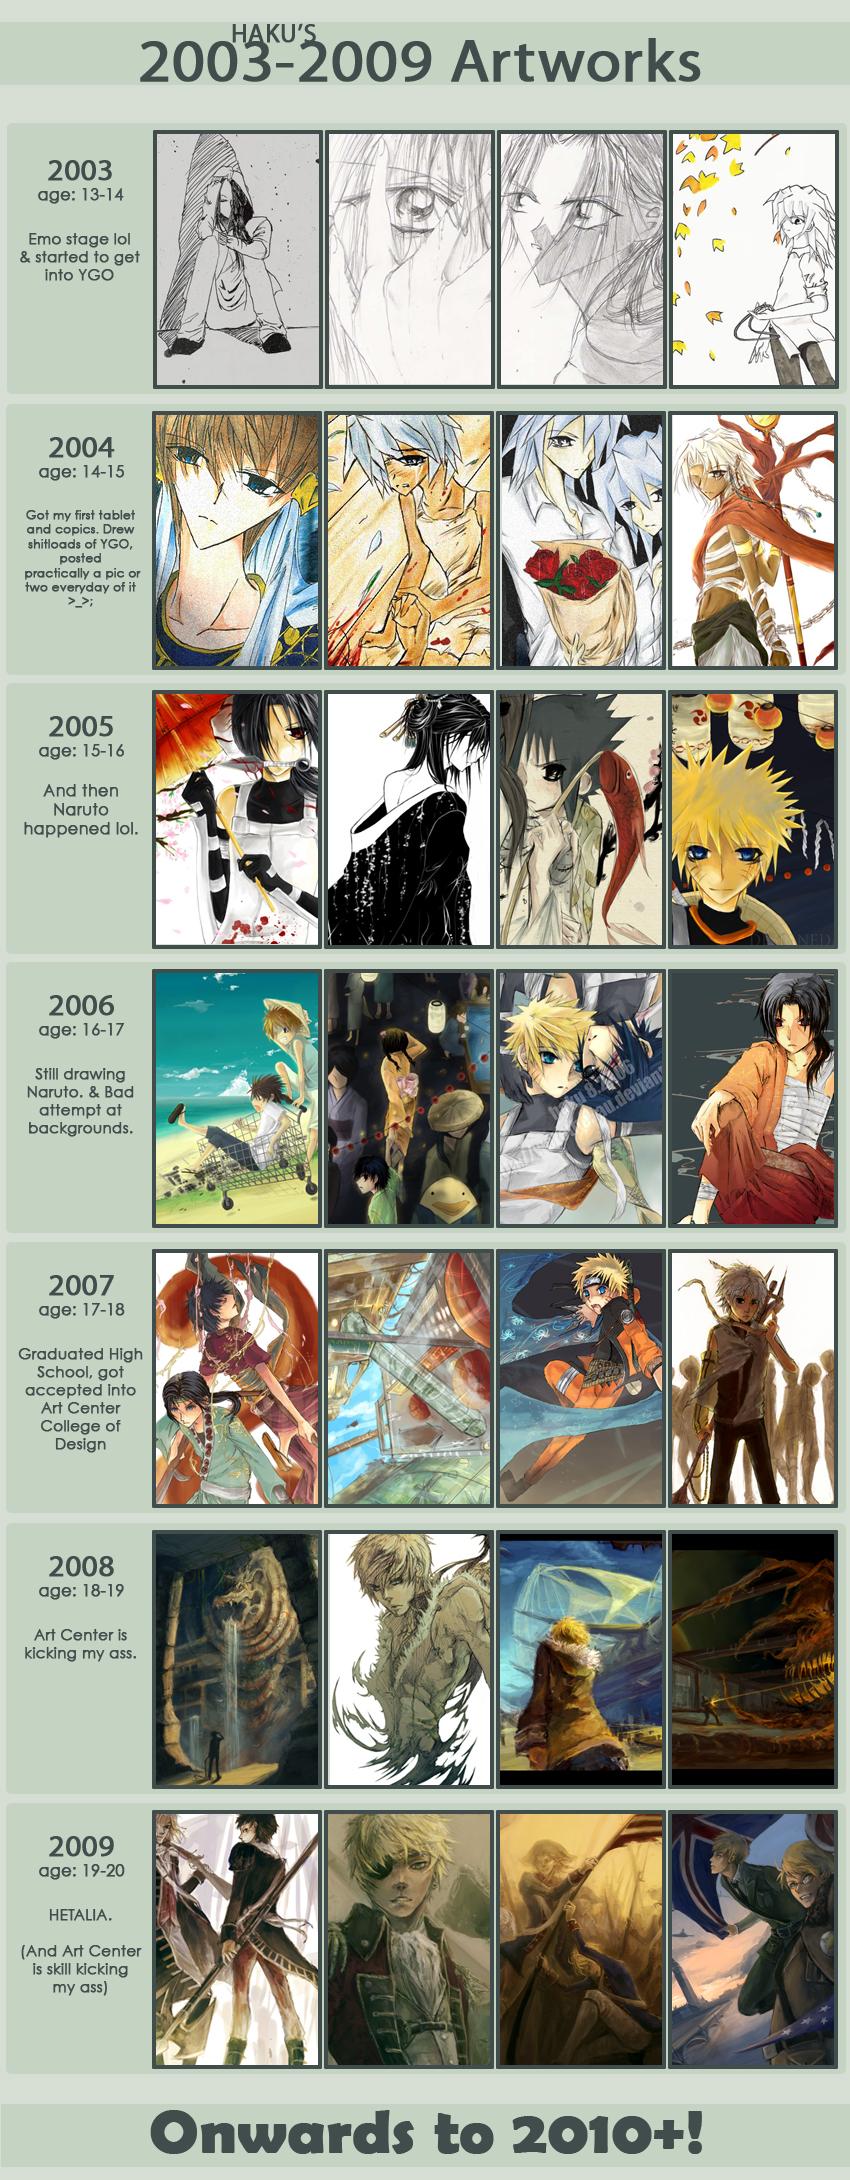 03-09 improvement meme by hakuku